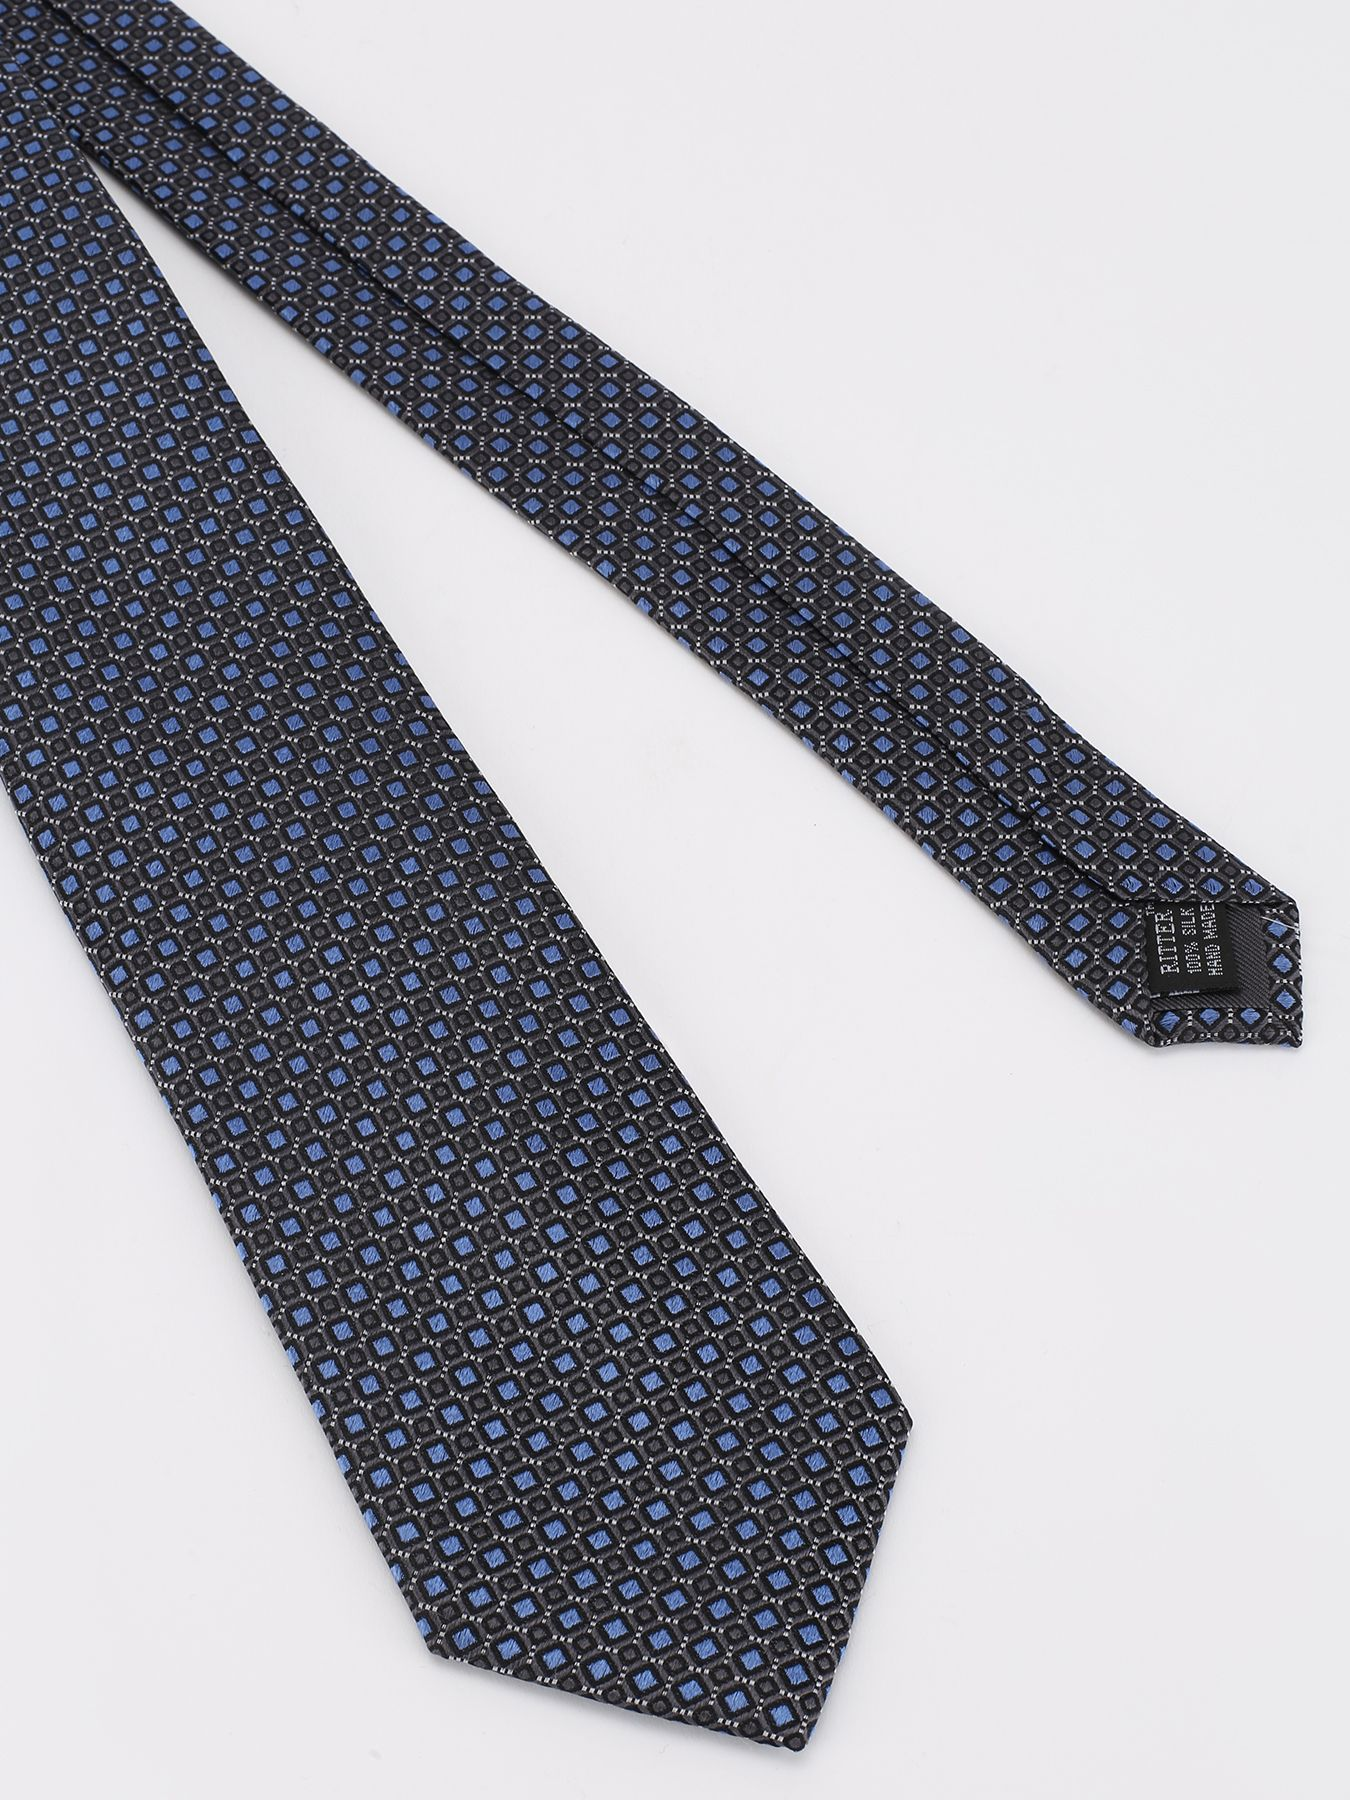 Ritter Шелковый галстук 312364-185 Фото 3